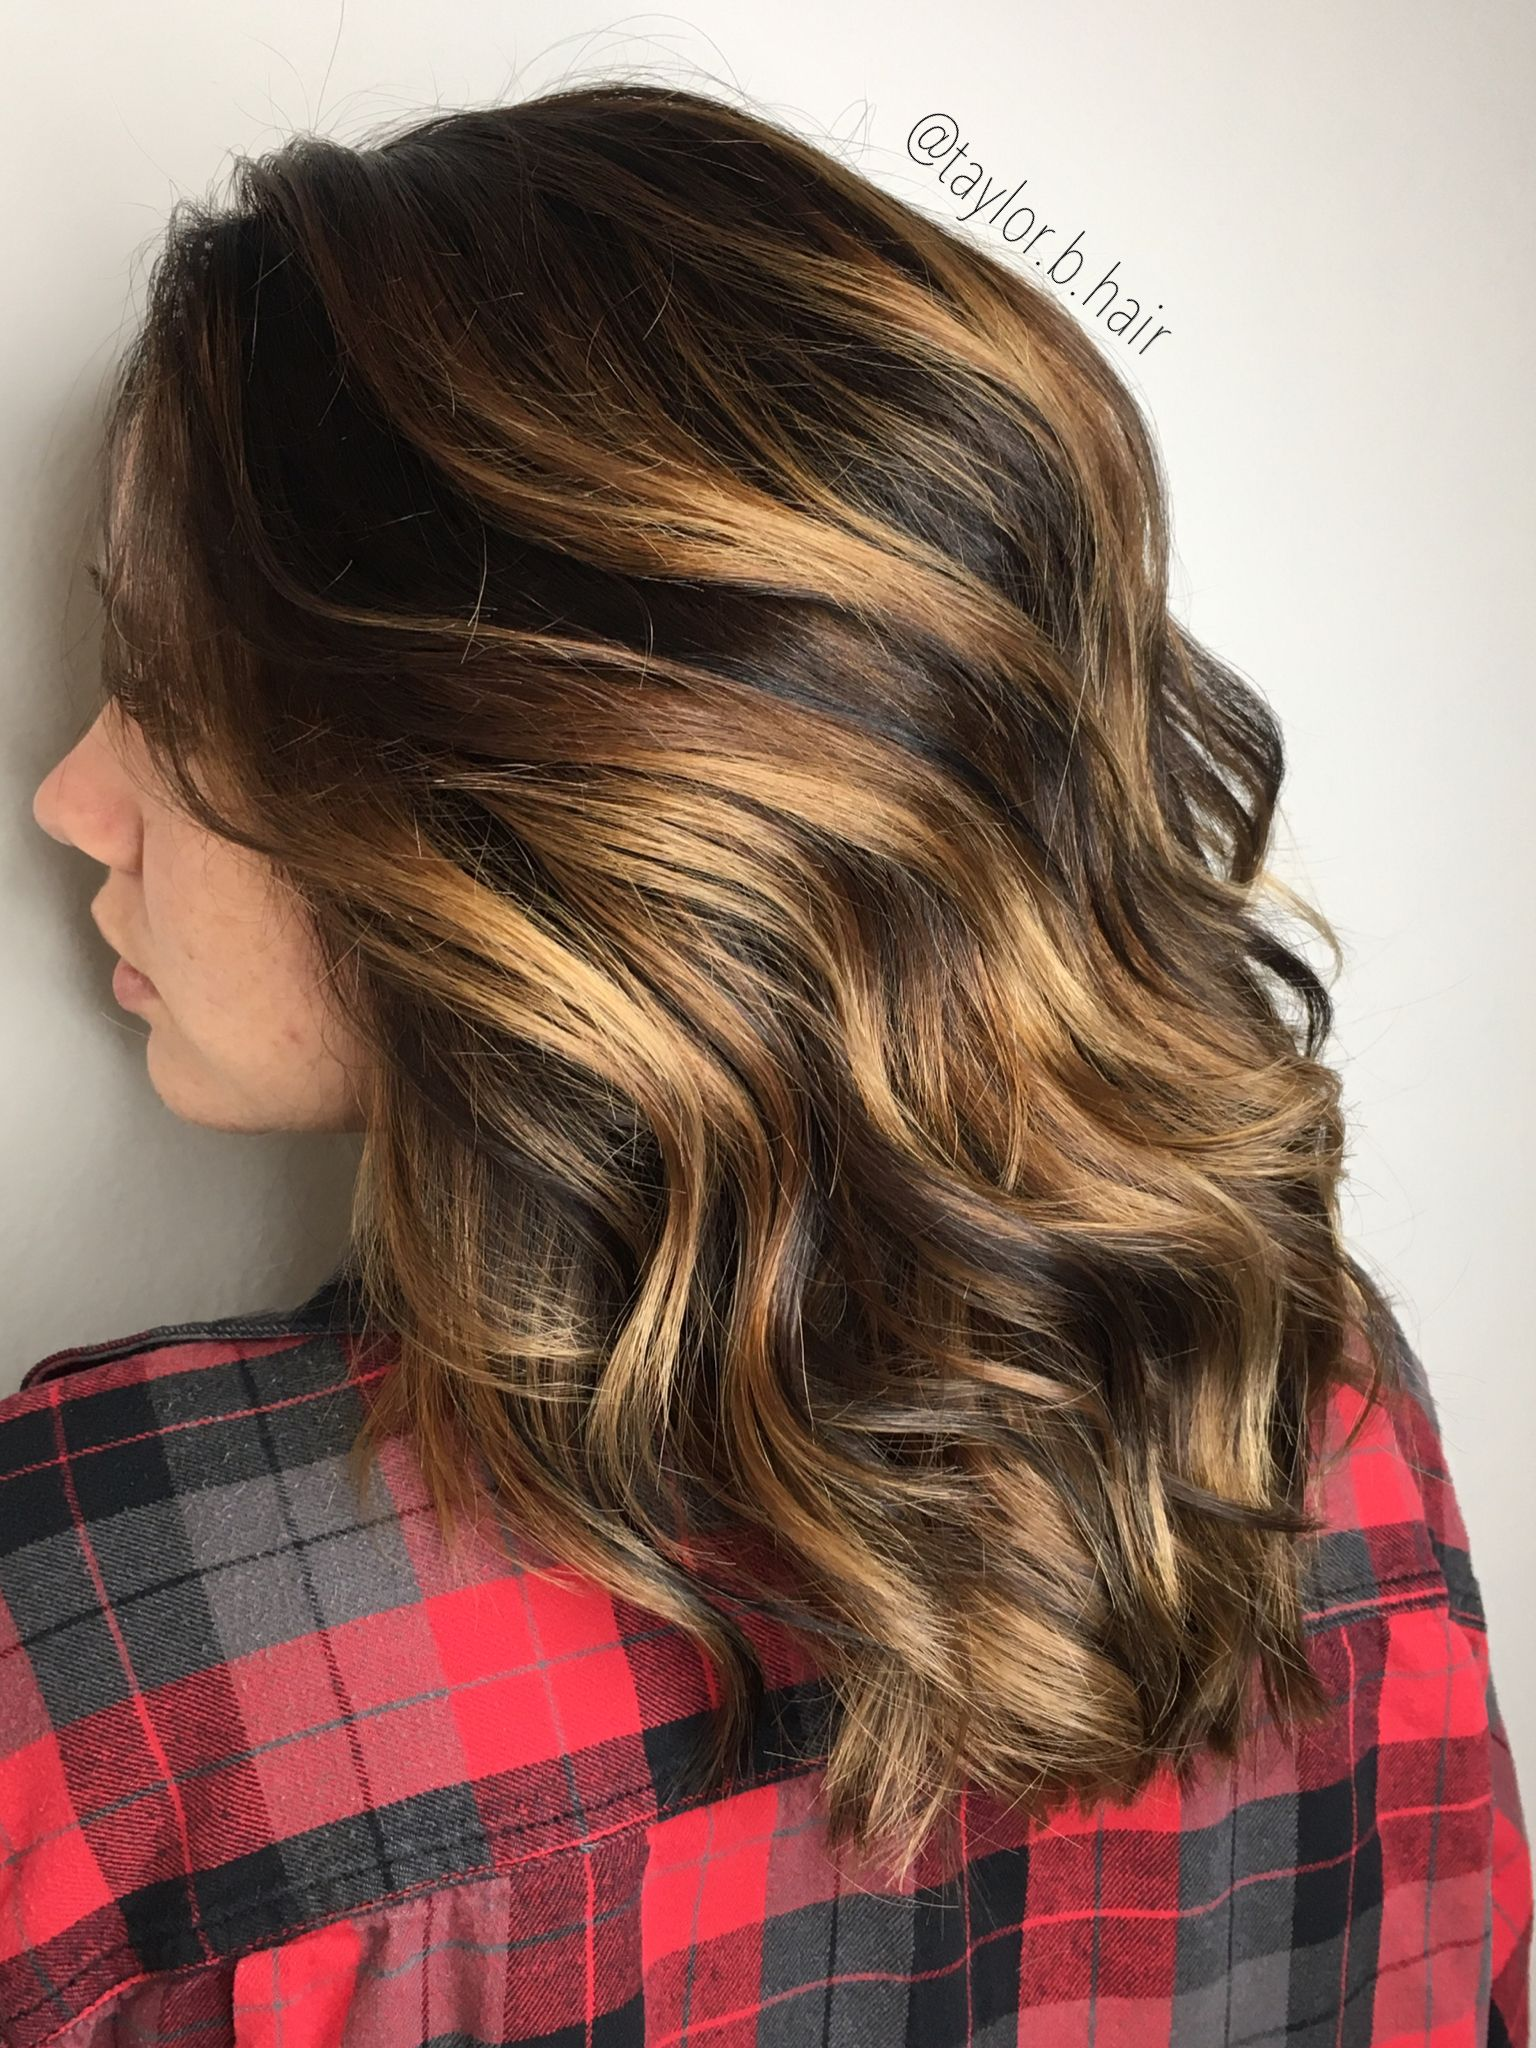 Short Curly Hair Caramel Balayage Rooted Brunette Brunette